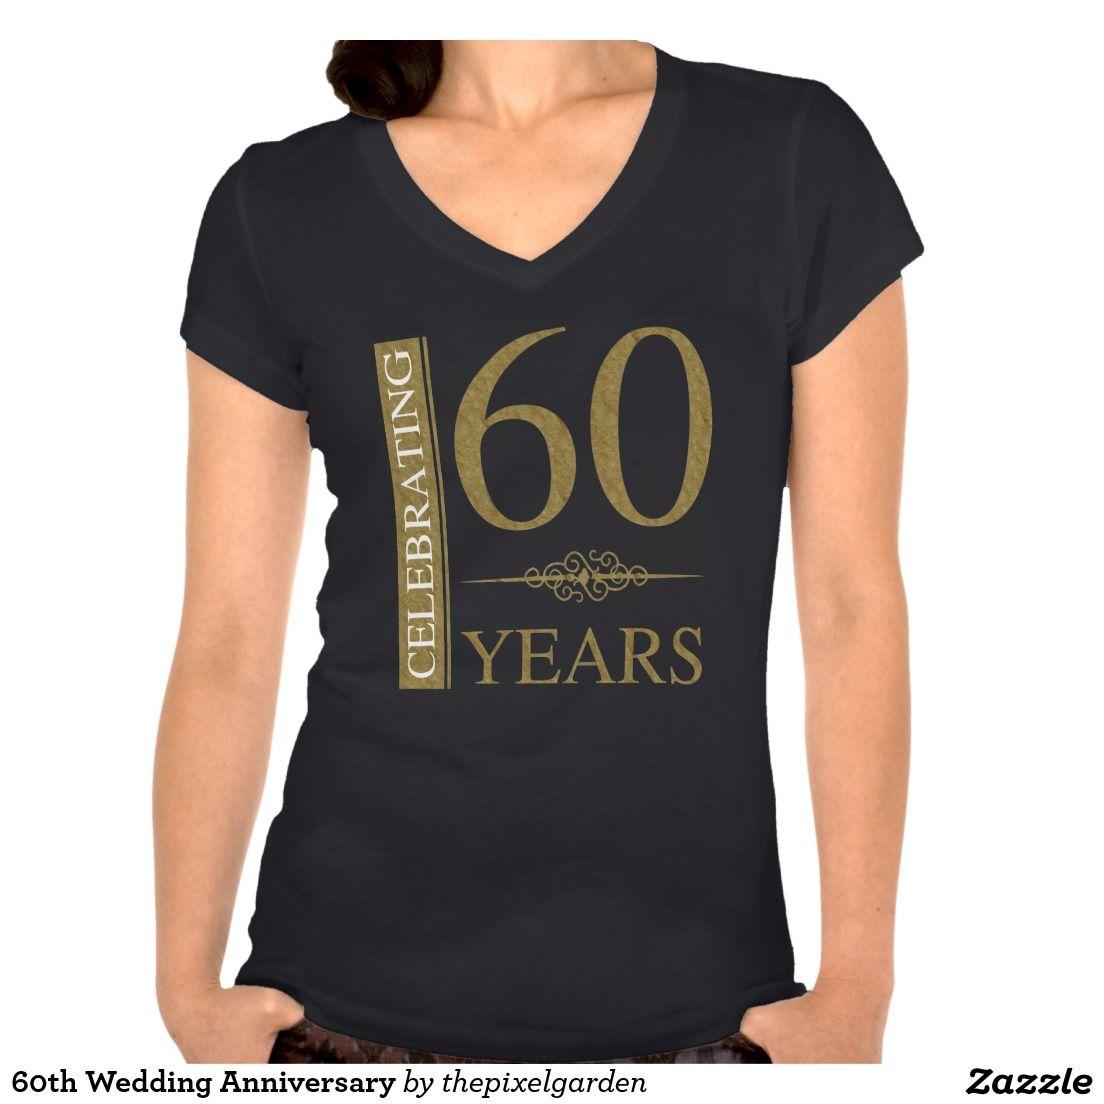 60th Wedding Anniversary T Shirt All Things Zazzle Shirts T